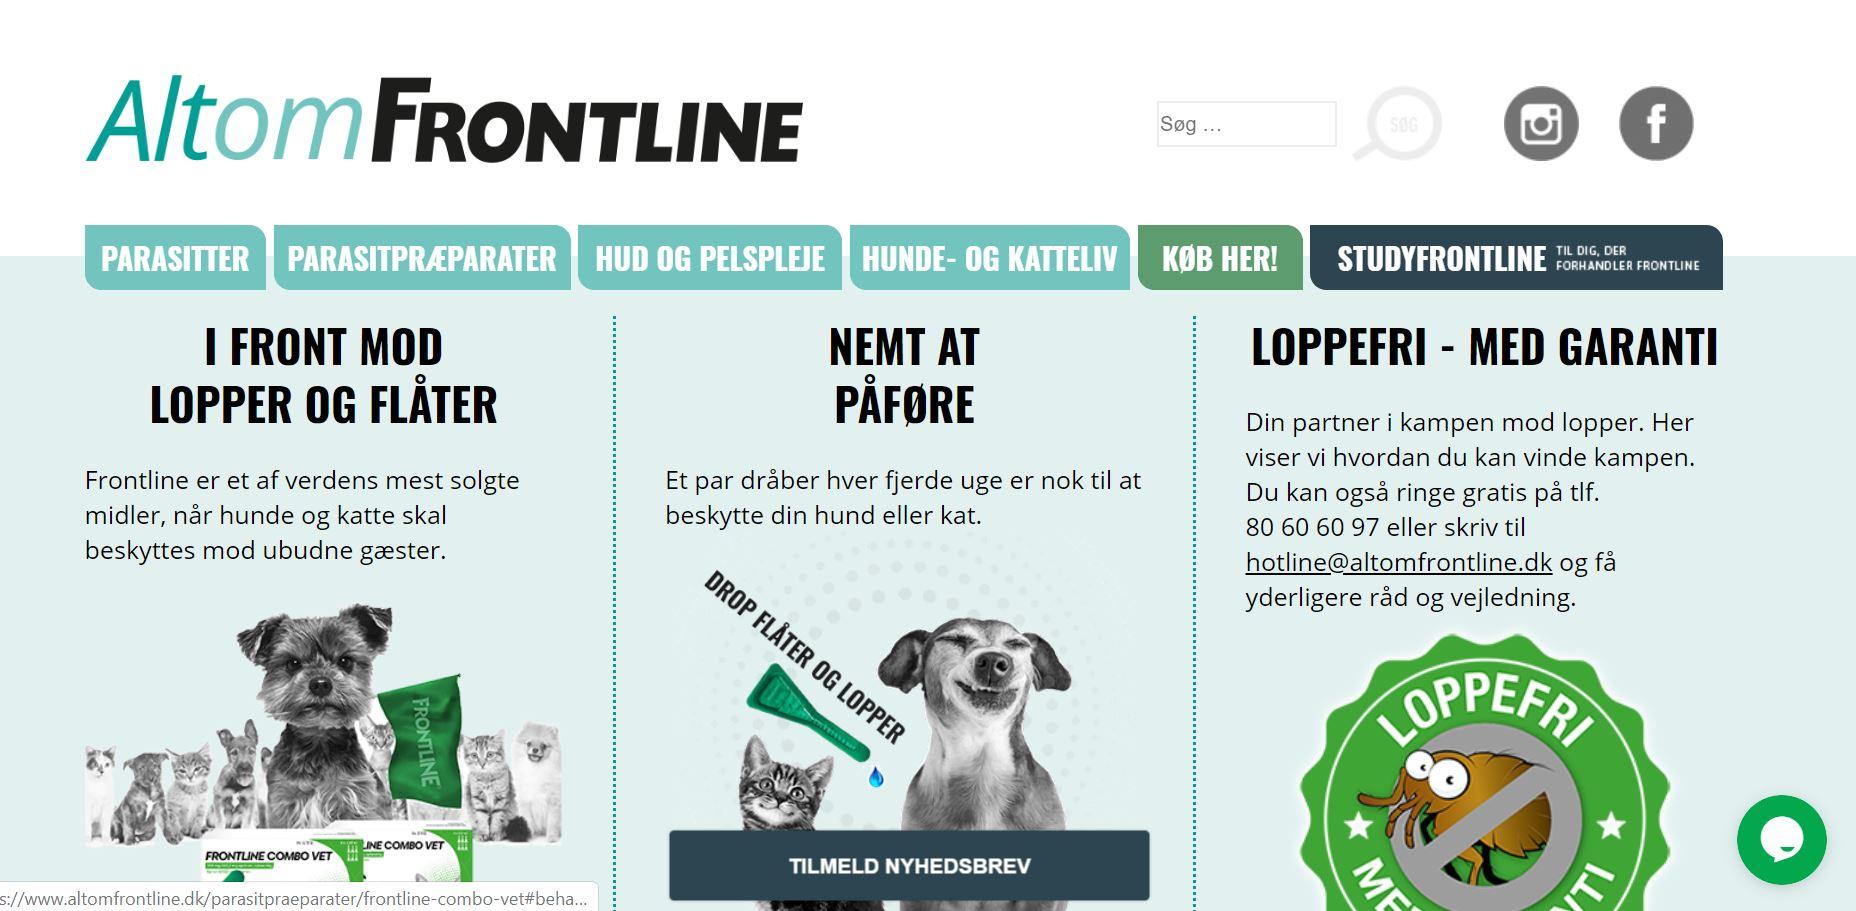 Frontline nyt website (Boehringer Ingelheim)